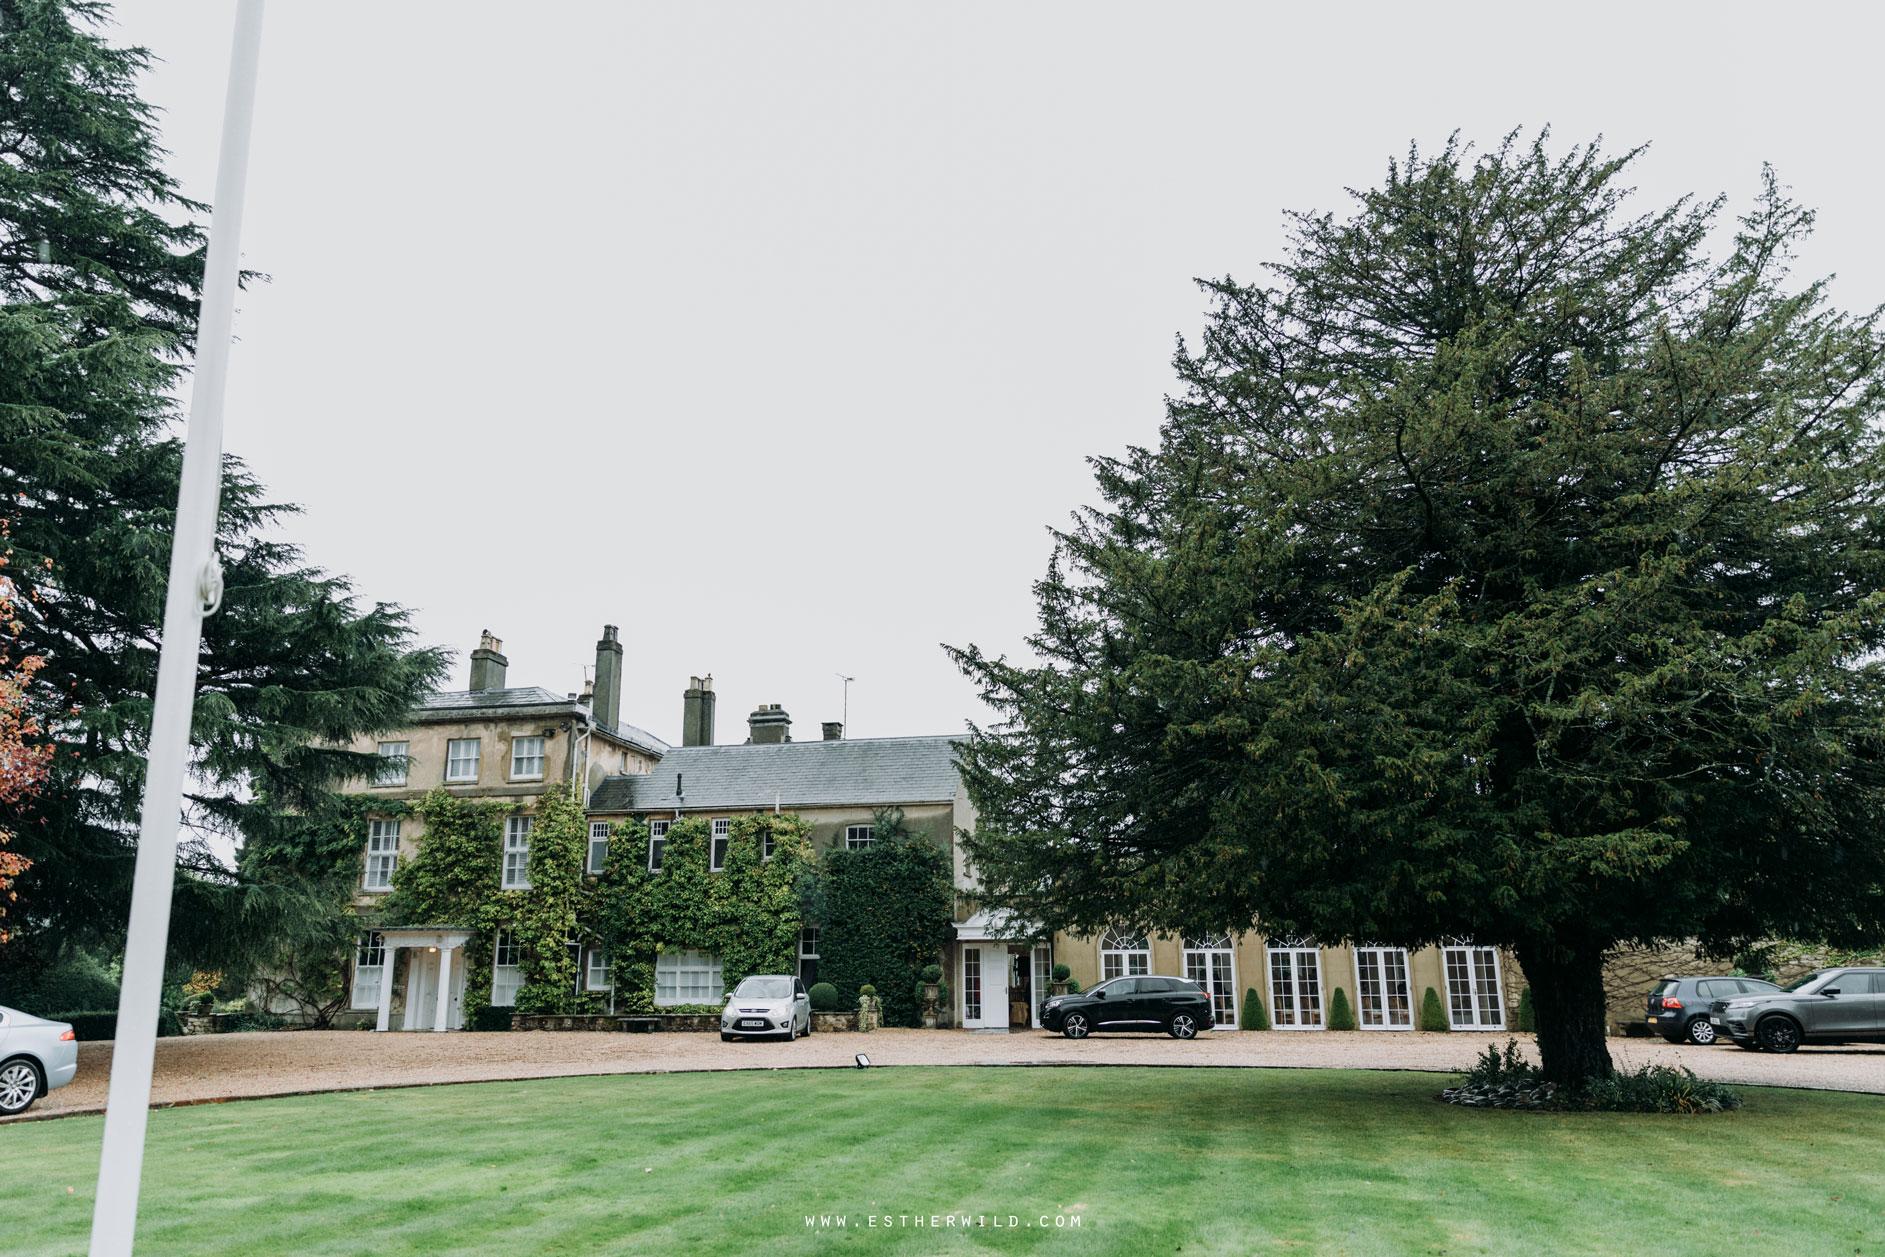 Northbrook_Park_Farnham_Surrey_London_Wedding_Hindu_Fusion_Esther_Wild_Photographer_IMG_3113.jpg